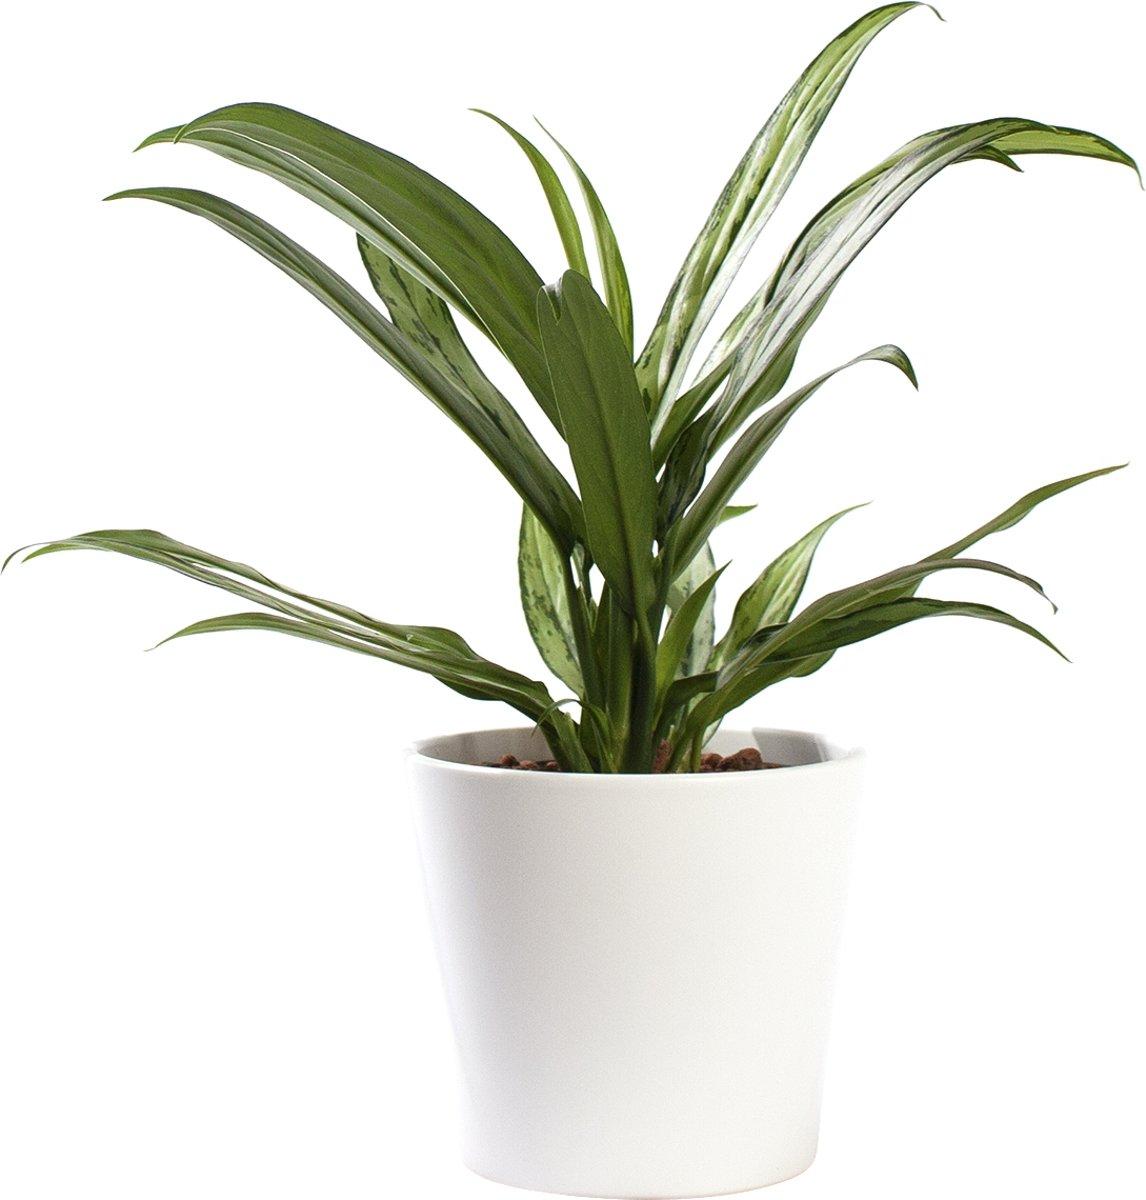 Plant in hydrocultuur systeem van Botanicly: Aglaonema met weinig onderhoud – in wit kleurig hydrocultuur sierpot – Hoogte: 30 cm – Aglaonema commutatum Cutlass